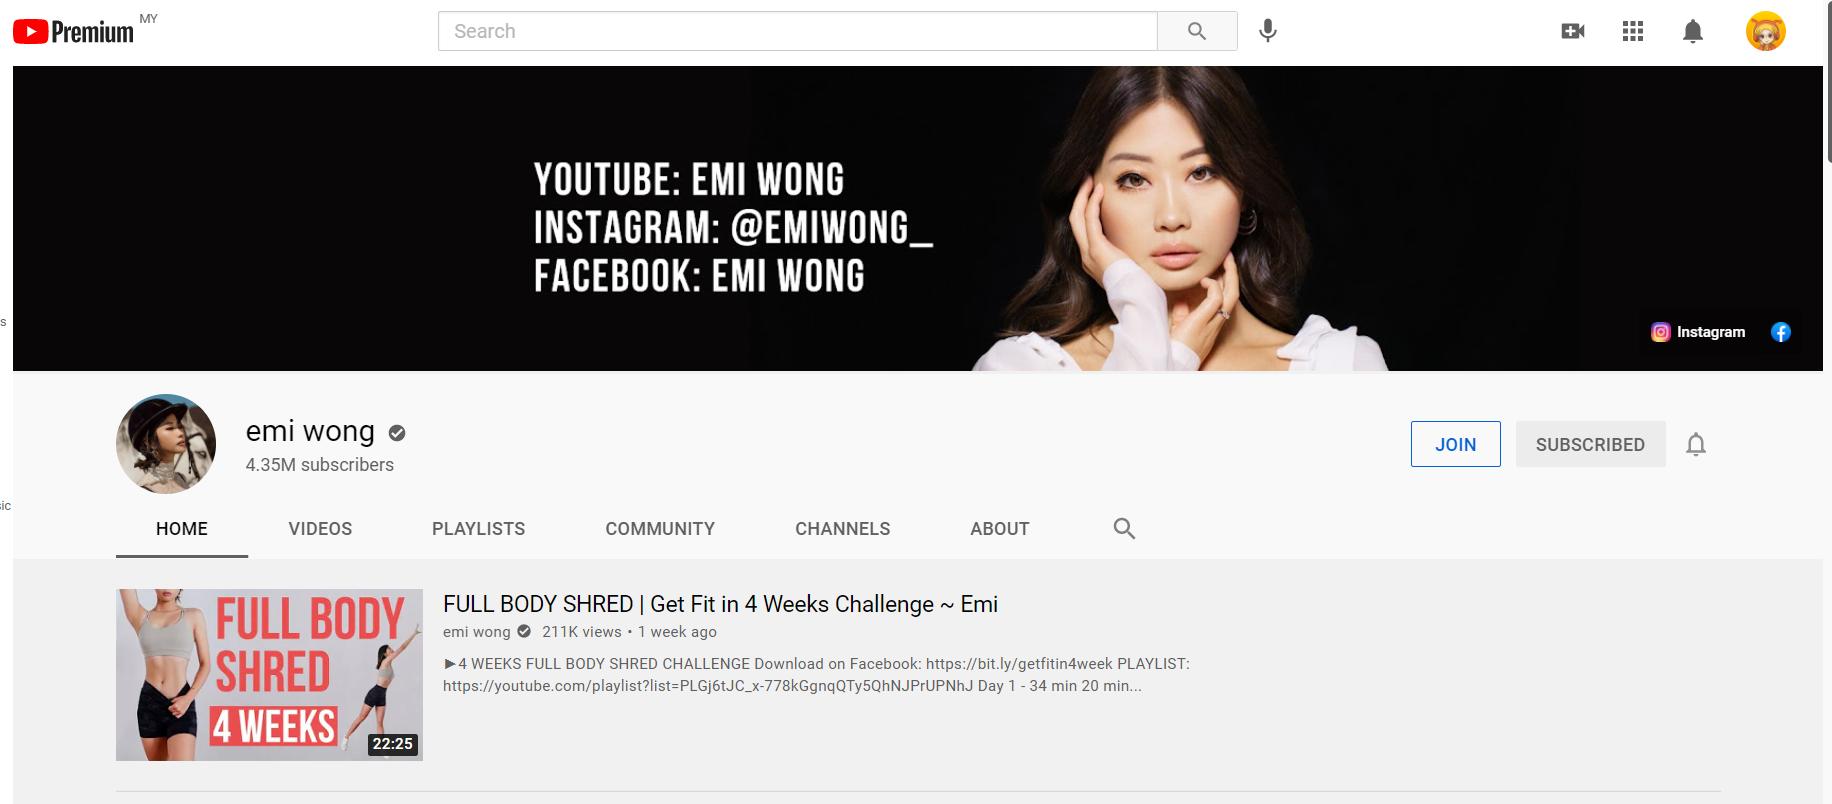 YouTube channel Emi Wong